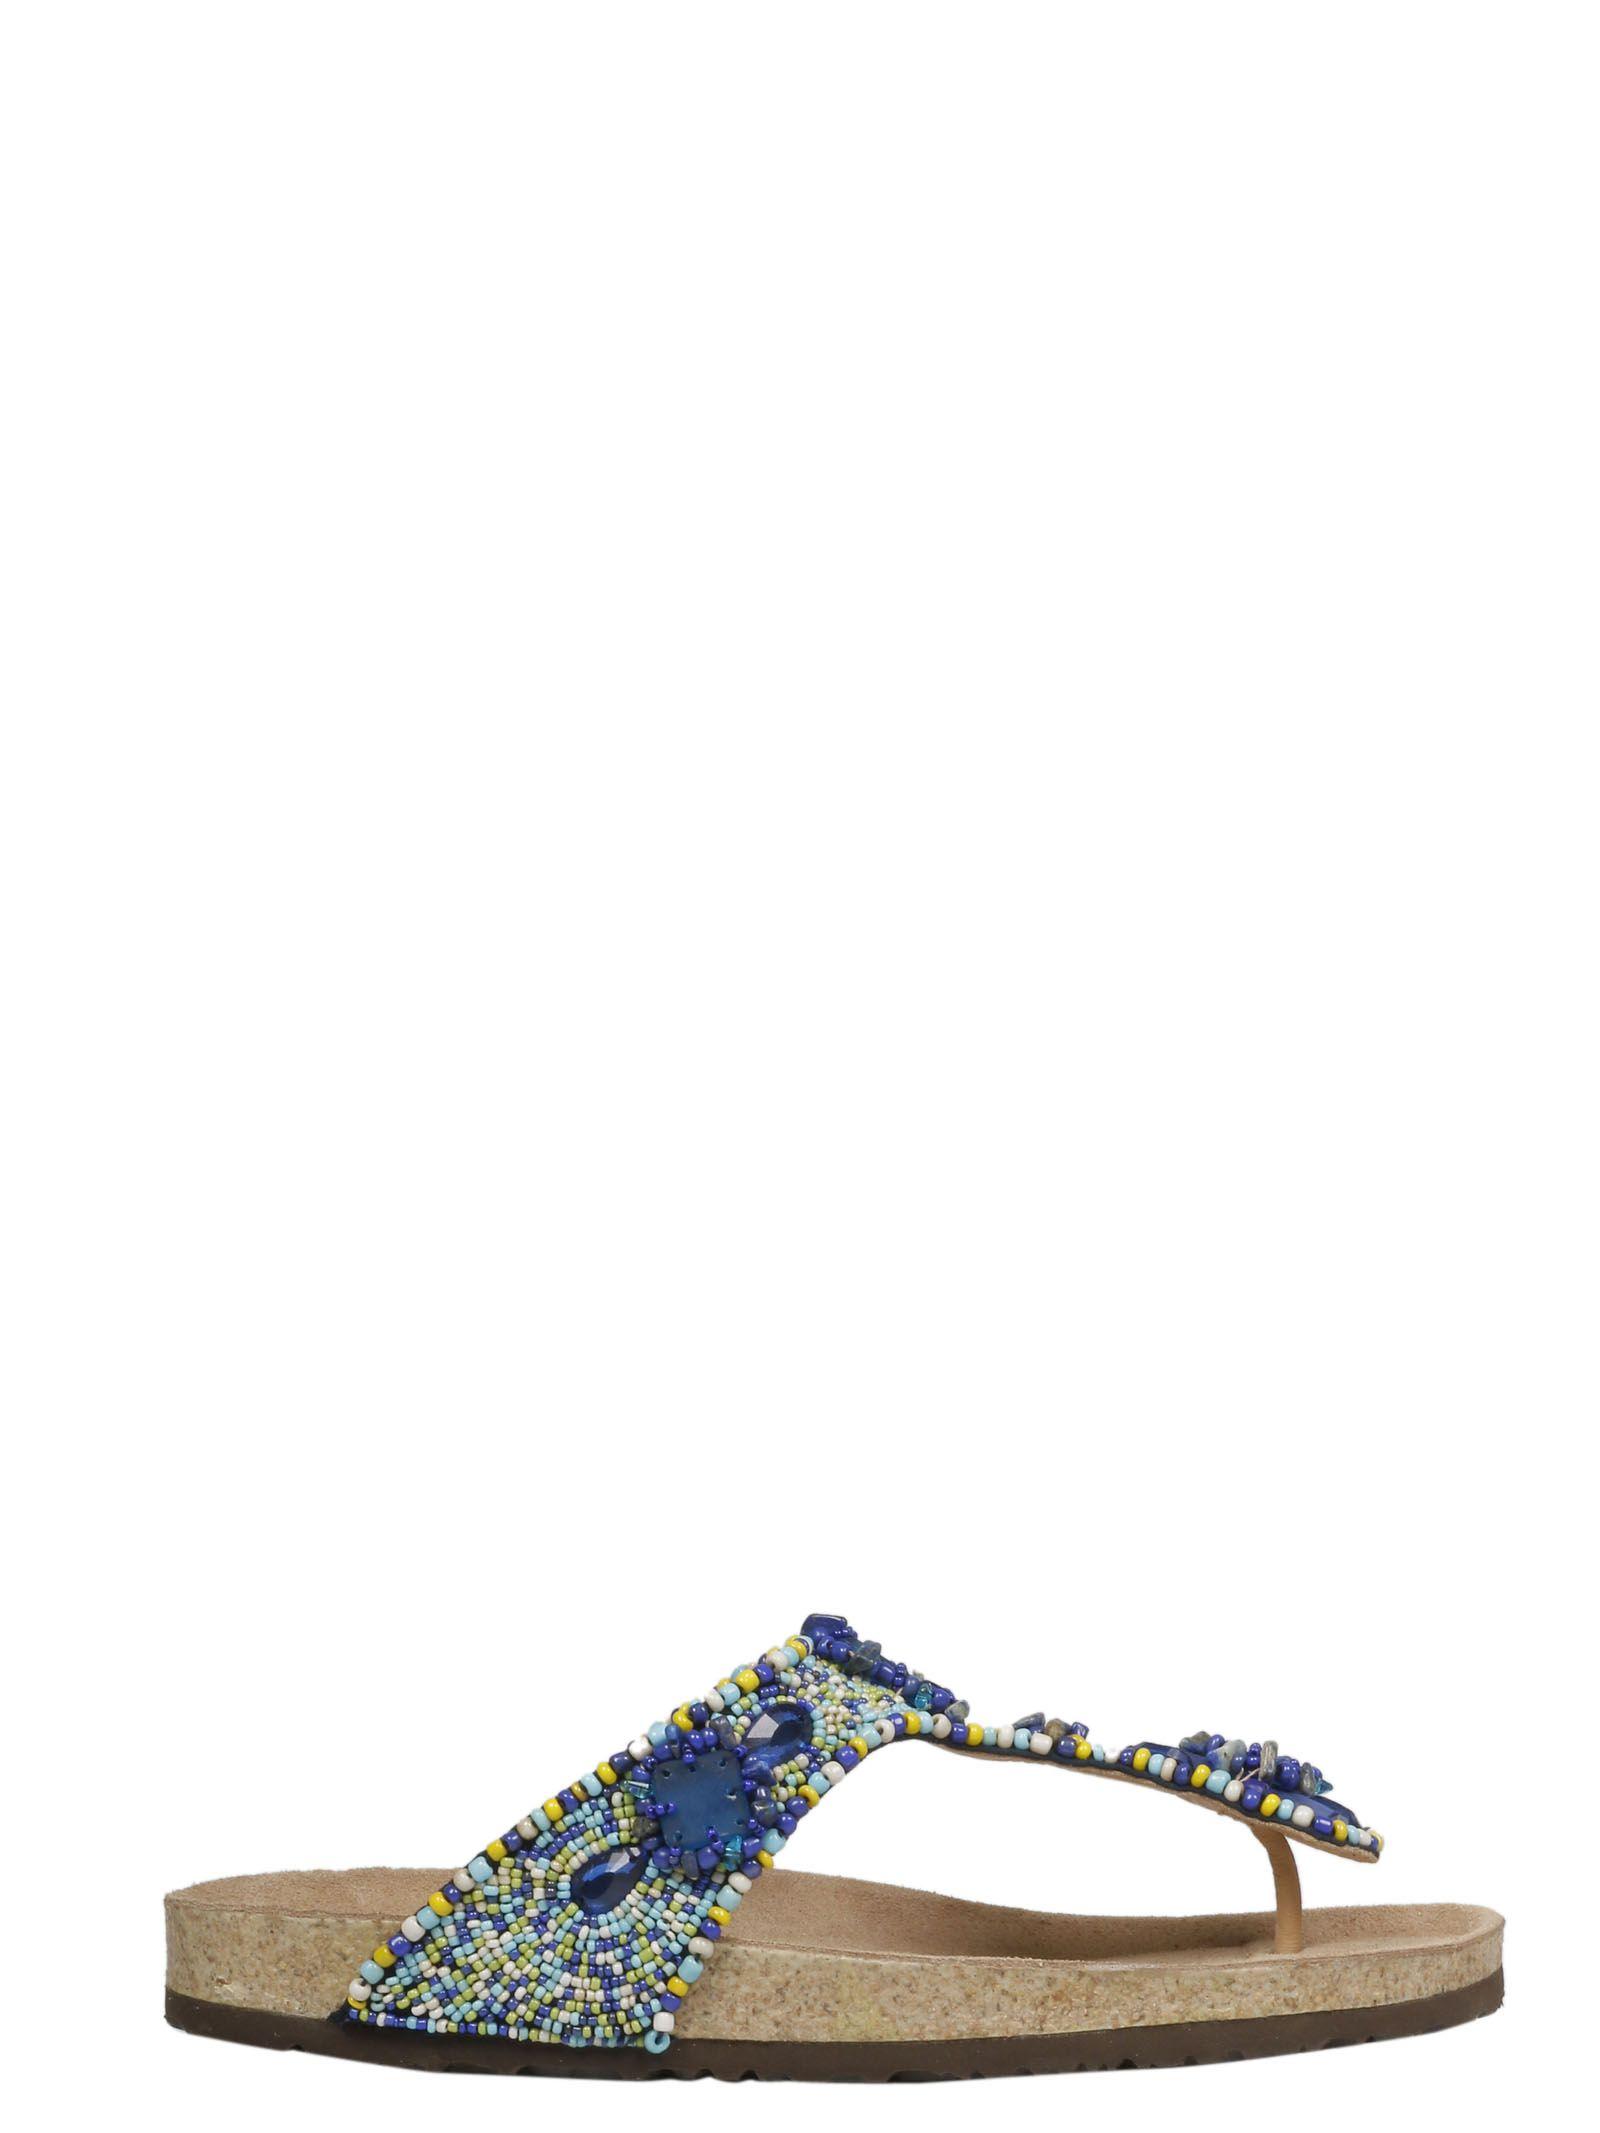 5b0dd32e9 Malìparmi Maliparmi Beaded Flip Flops - 10859236